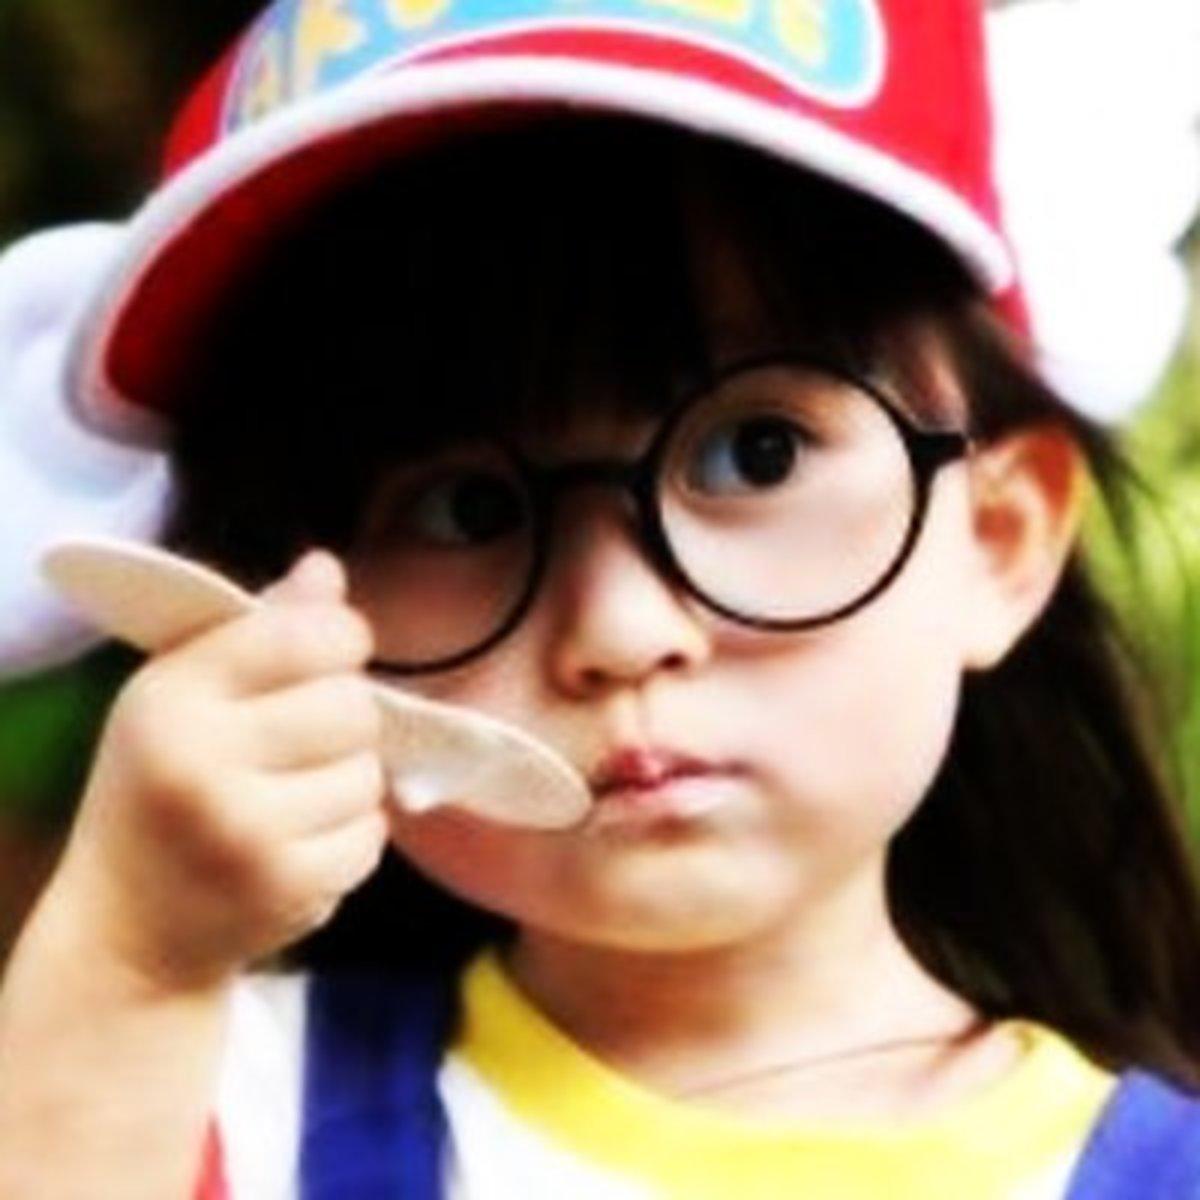 Arale-Chan Kid Cosplay